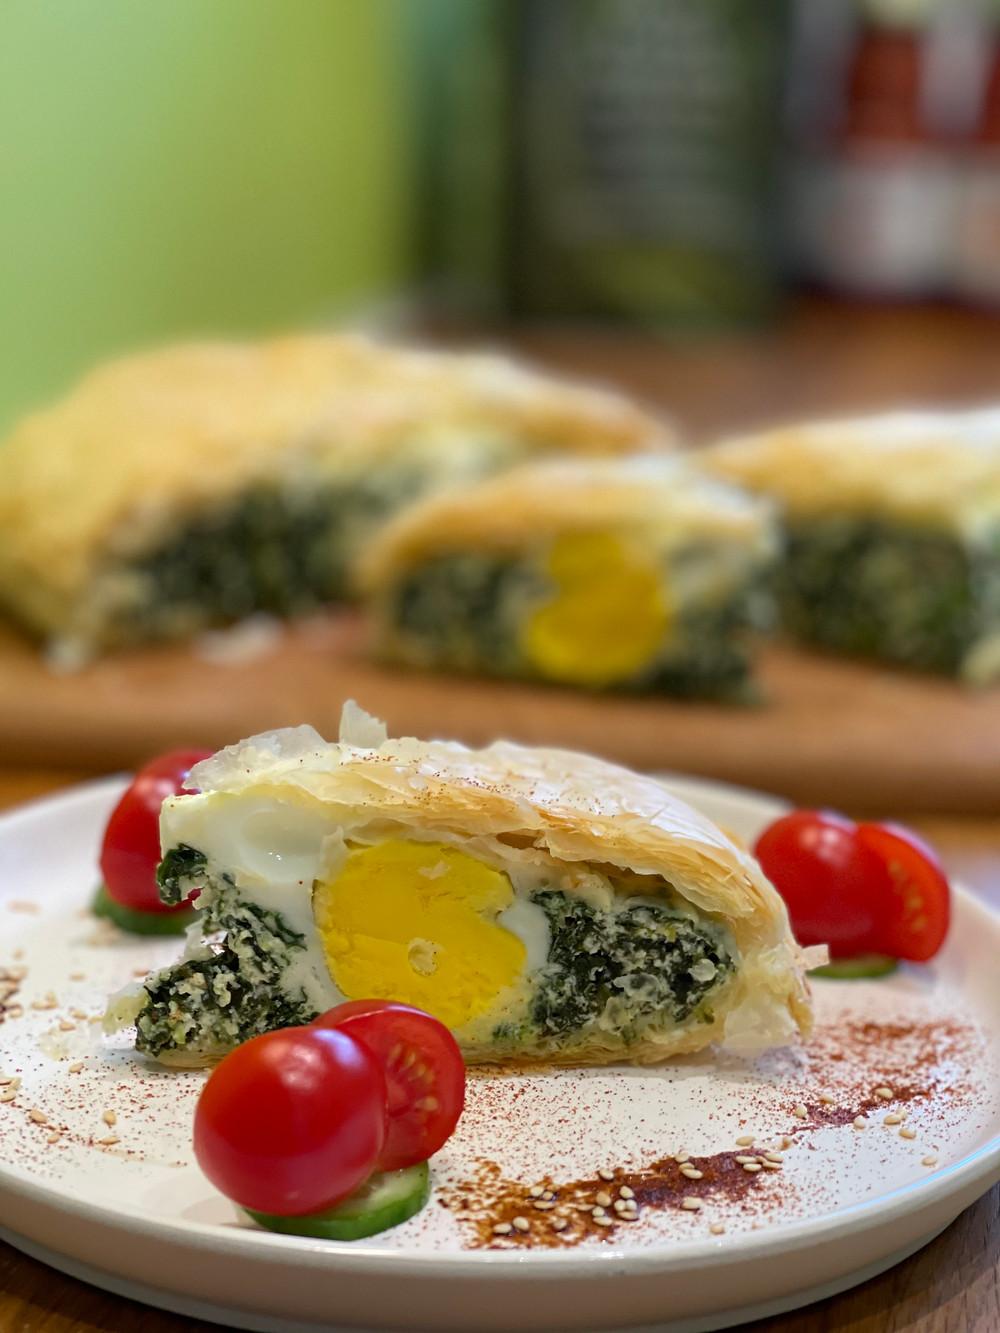 Torta Pasqualina by Agridistribution